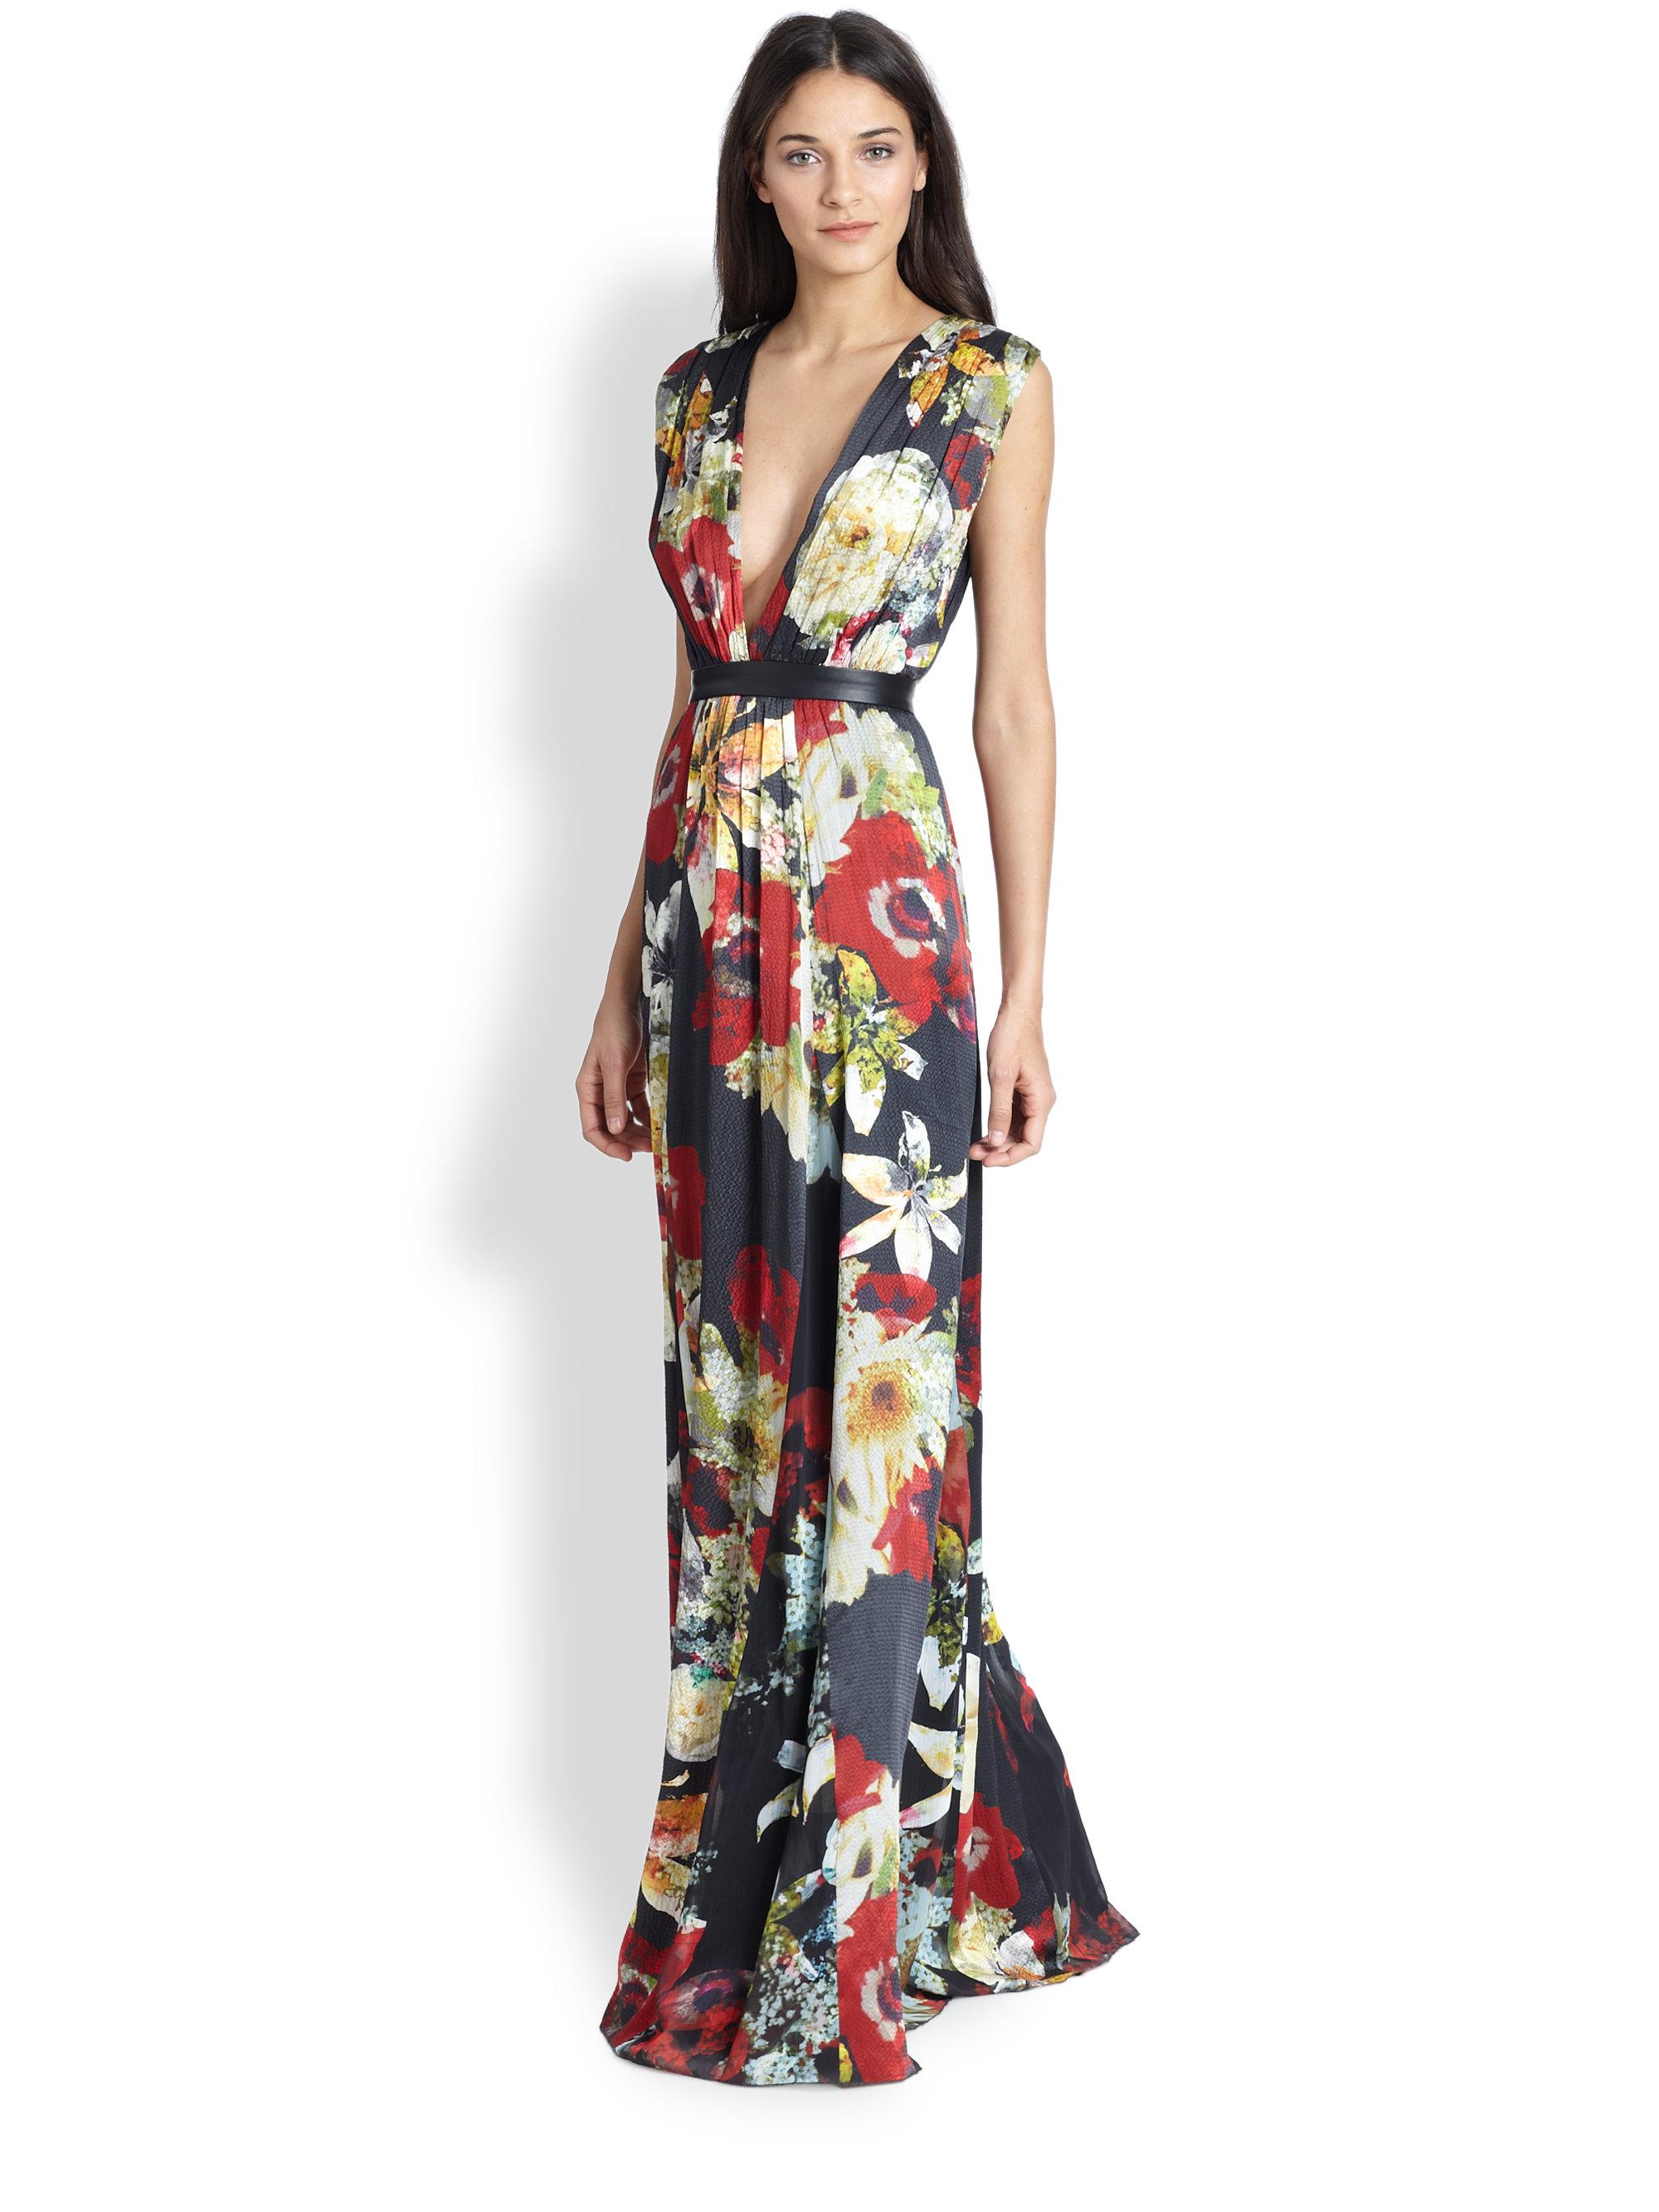 Lyst - Alice + Olivia Triss Floralprint Sleeveless Maxi Dress Alice ...